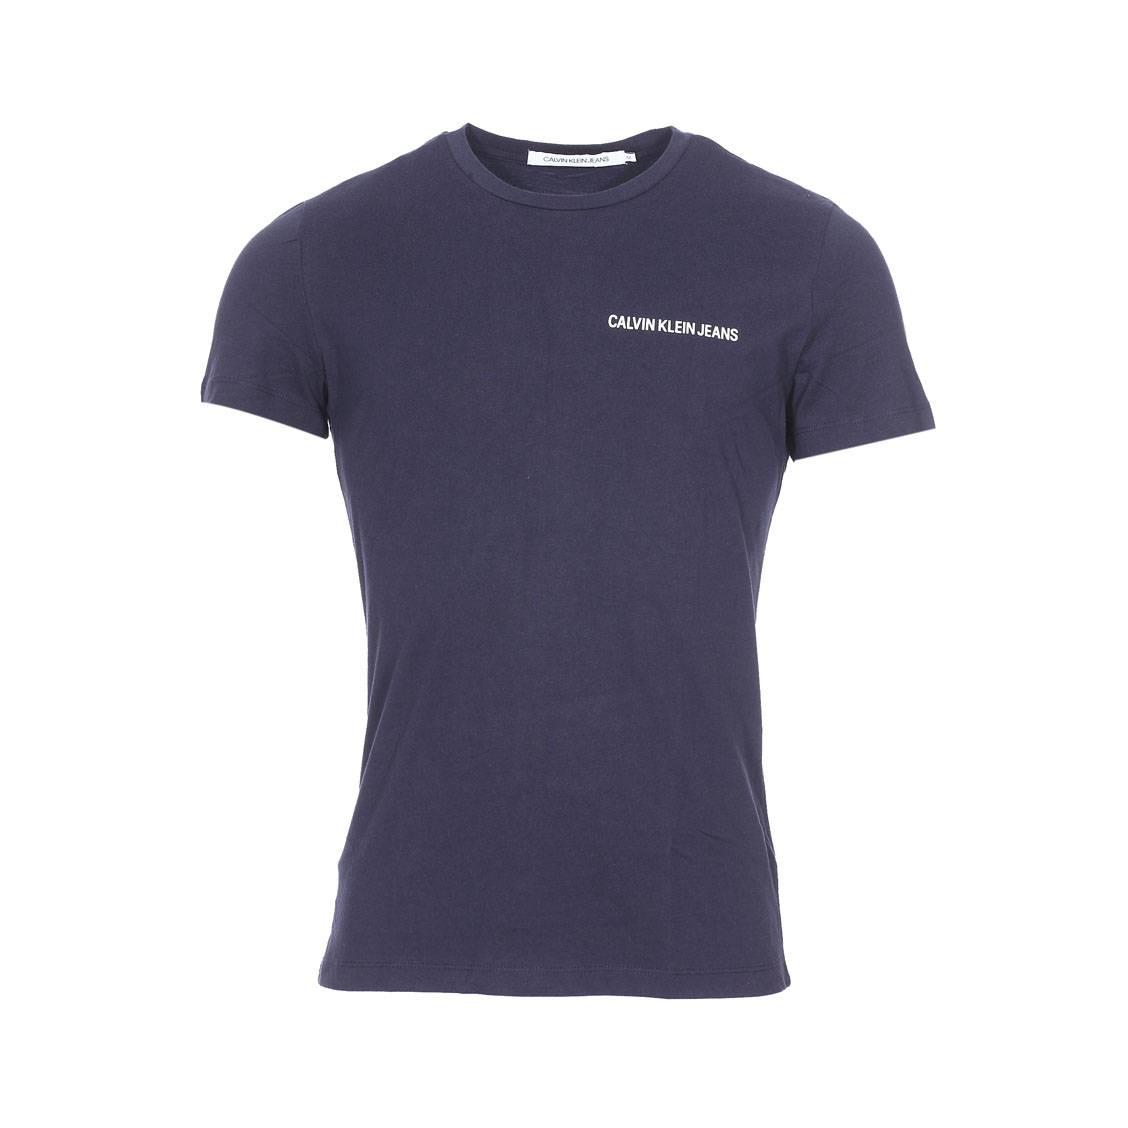 Tee-shirt col rond  small instit logo ch en coton bleu marine floqué en blanc